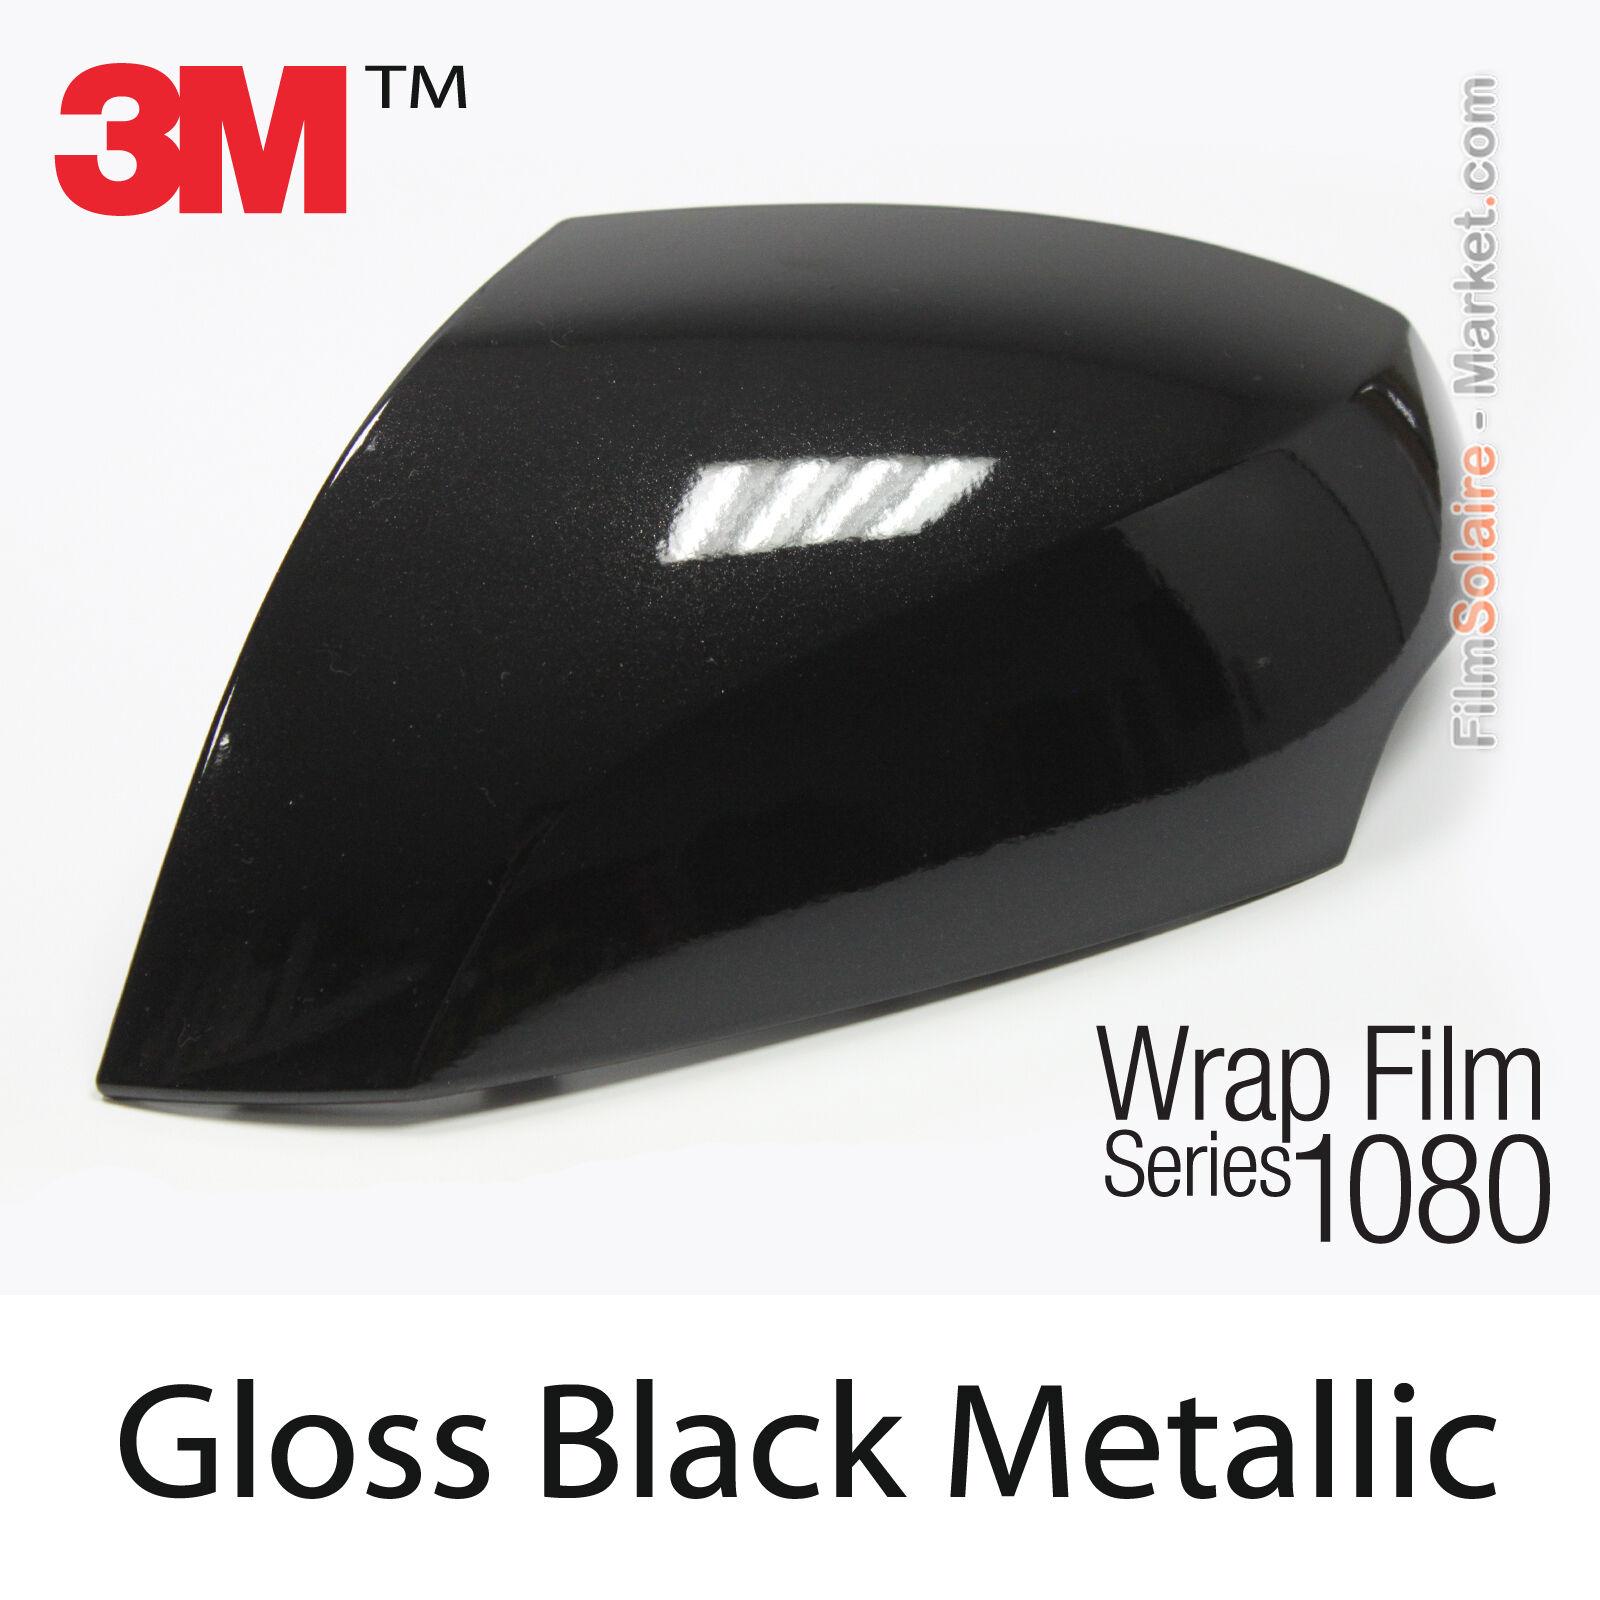 3M 1080 Series GLOSS BLACK METALLIC Vinyl Vehicle Car Wrap Decal Film Roll G212